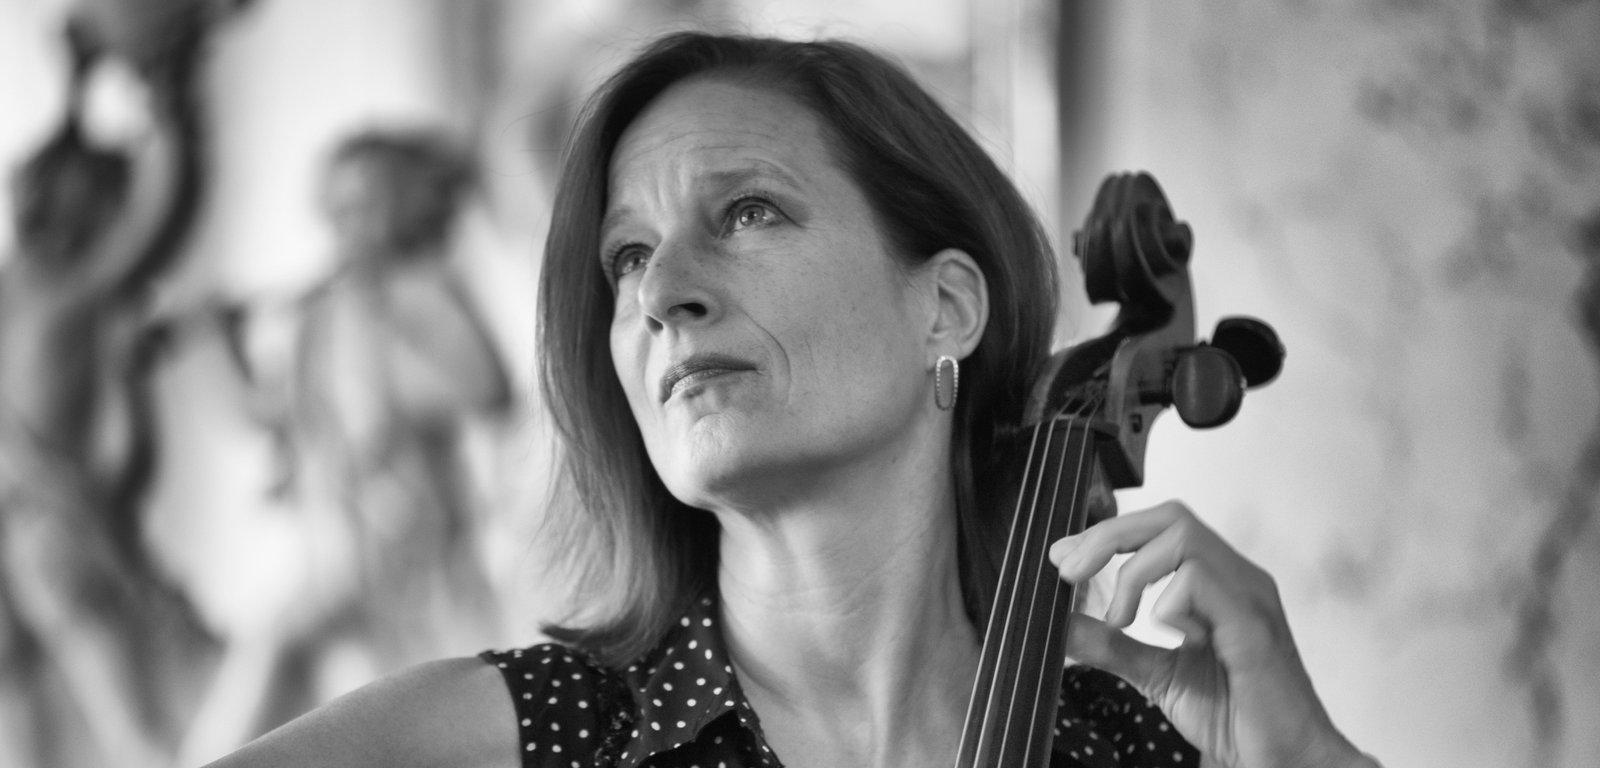 Anja Lechner